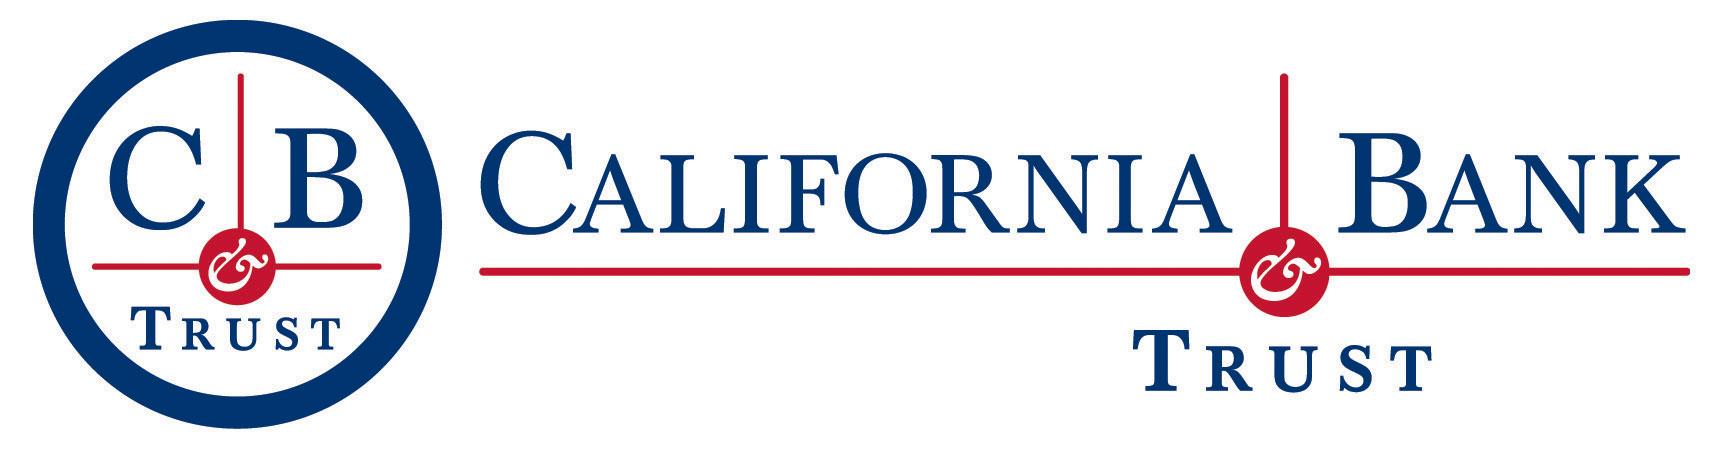 California Bank & Trust Scripps Poway